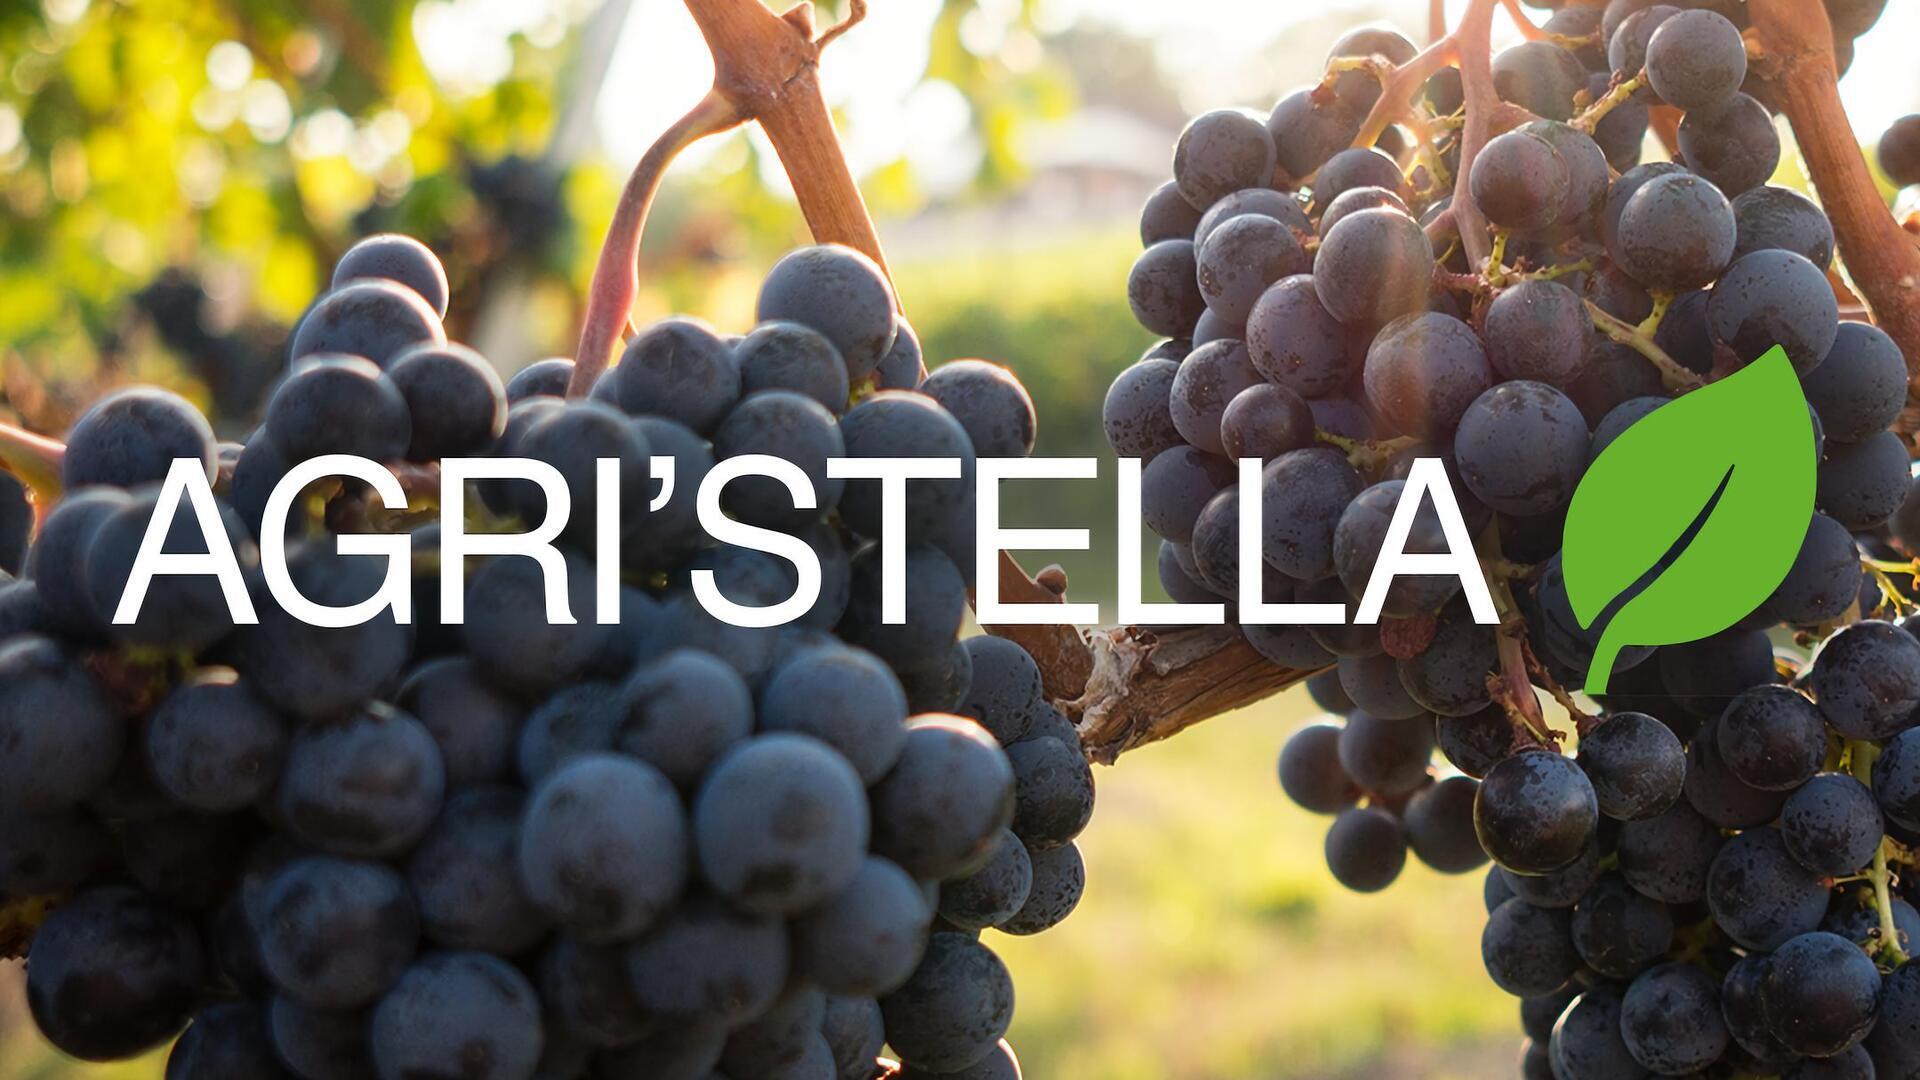 Agri'Stella : Soprappiu n°2, moments choisis et inédits